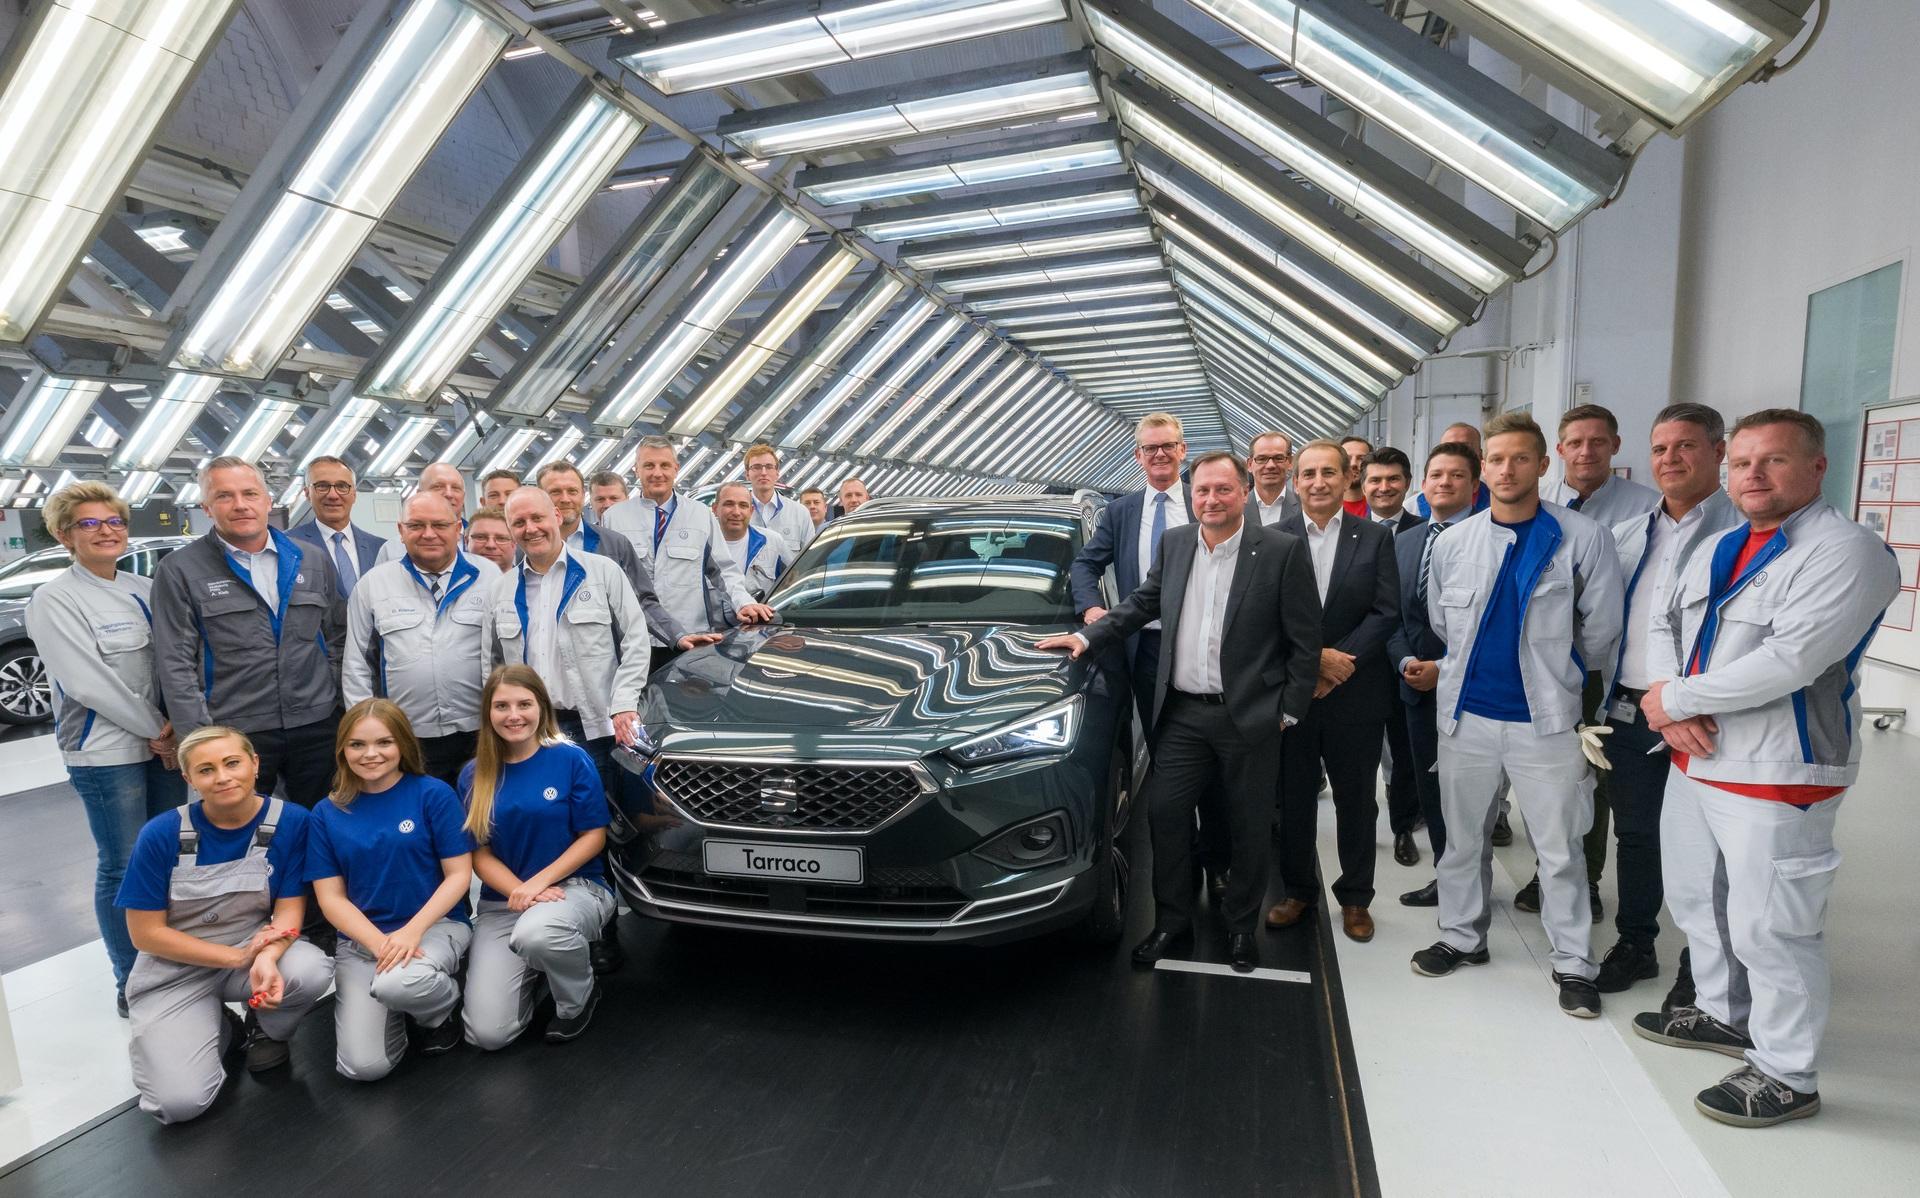 SEAT-Tarraco-production-starts-in-Wolfsburg_001_HQ